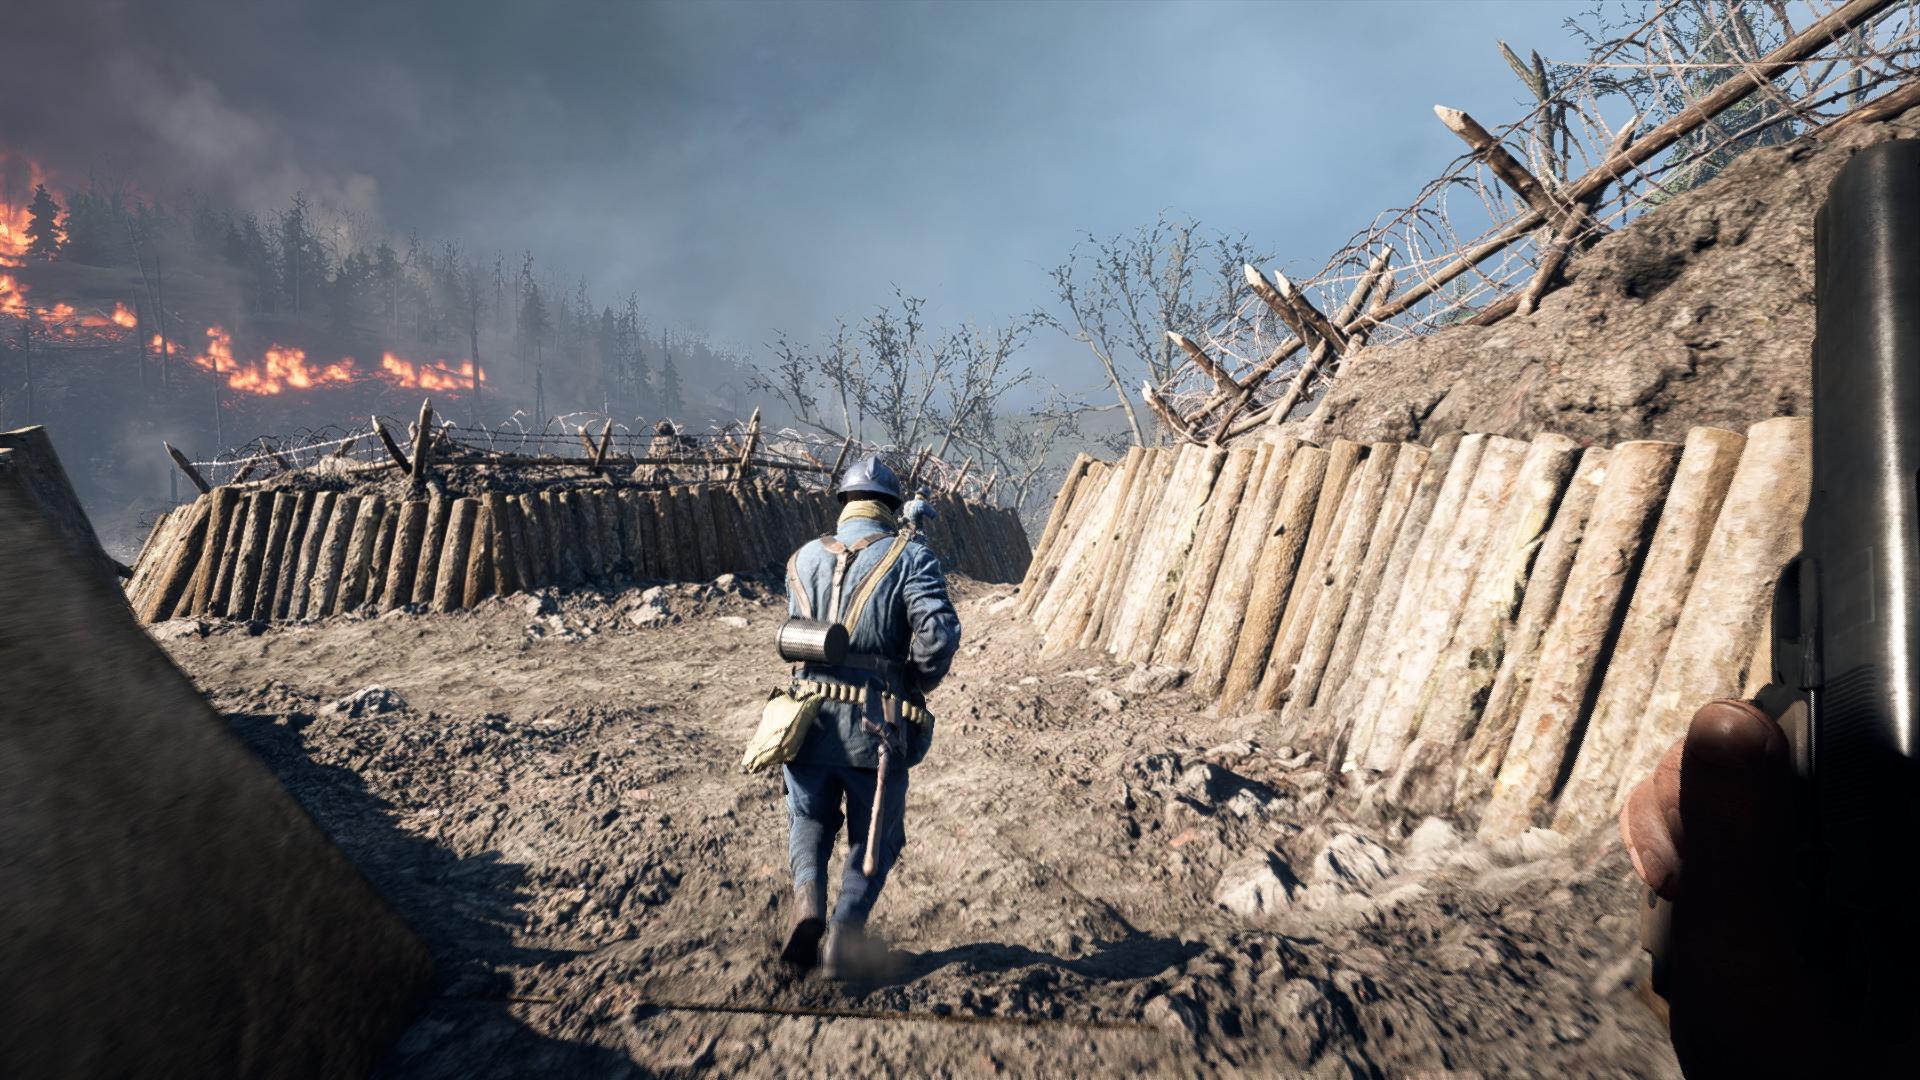 Battlefield 1: Premium Pass - čerstvé dojmy z krví promáčené Francie 140598